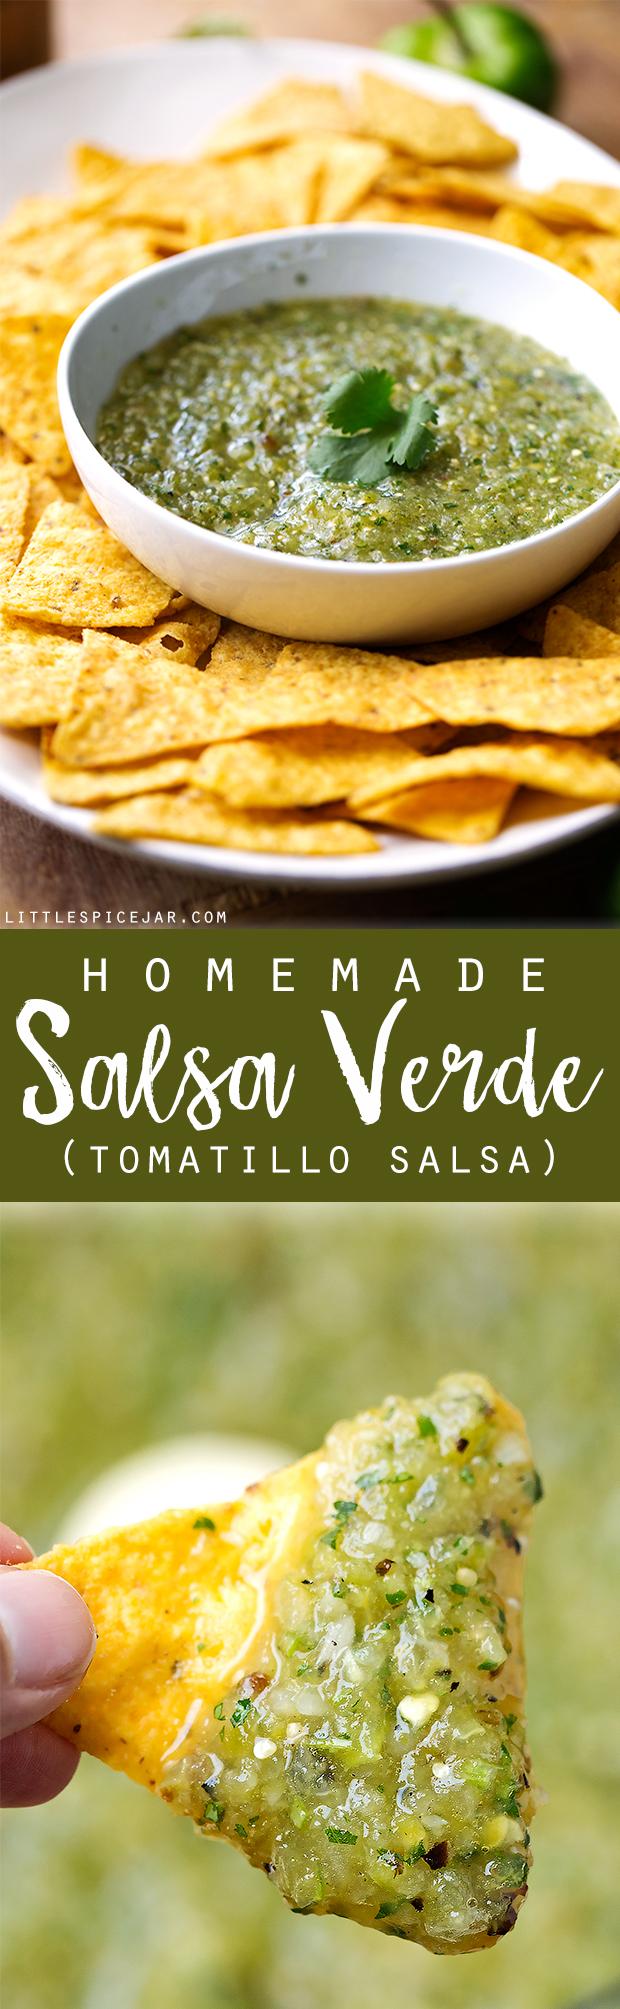 Homemade Salsa Verde (Tomatillo Salsa) - a classic restaurant favorite that's easy to make at home. My salsa verde tastes better than your favorite Mexican Restaurant! #salsa #salsaverde #tomatillosalsa   Littlepsicejar.com